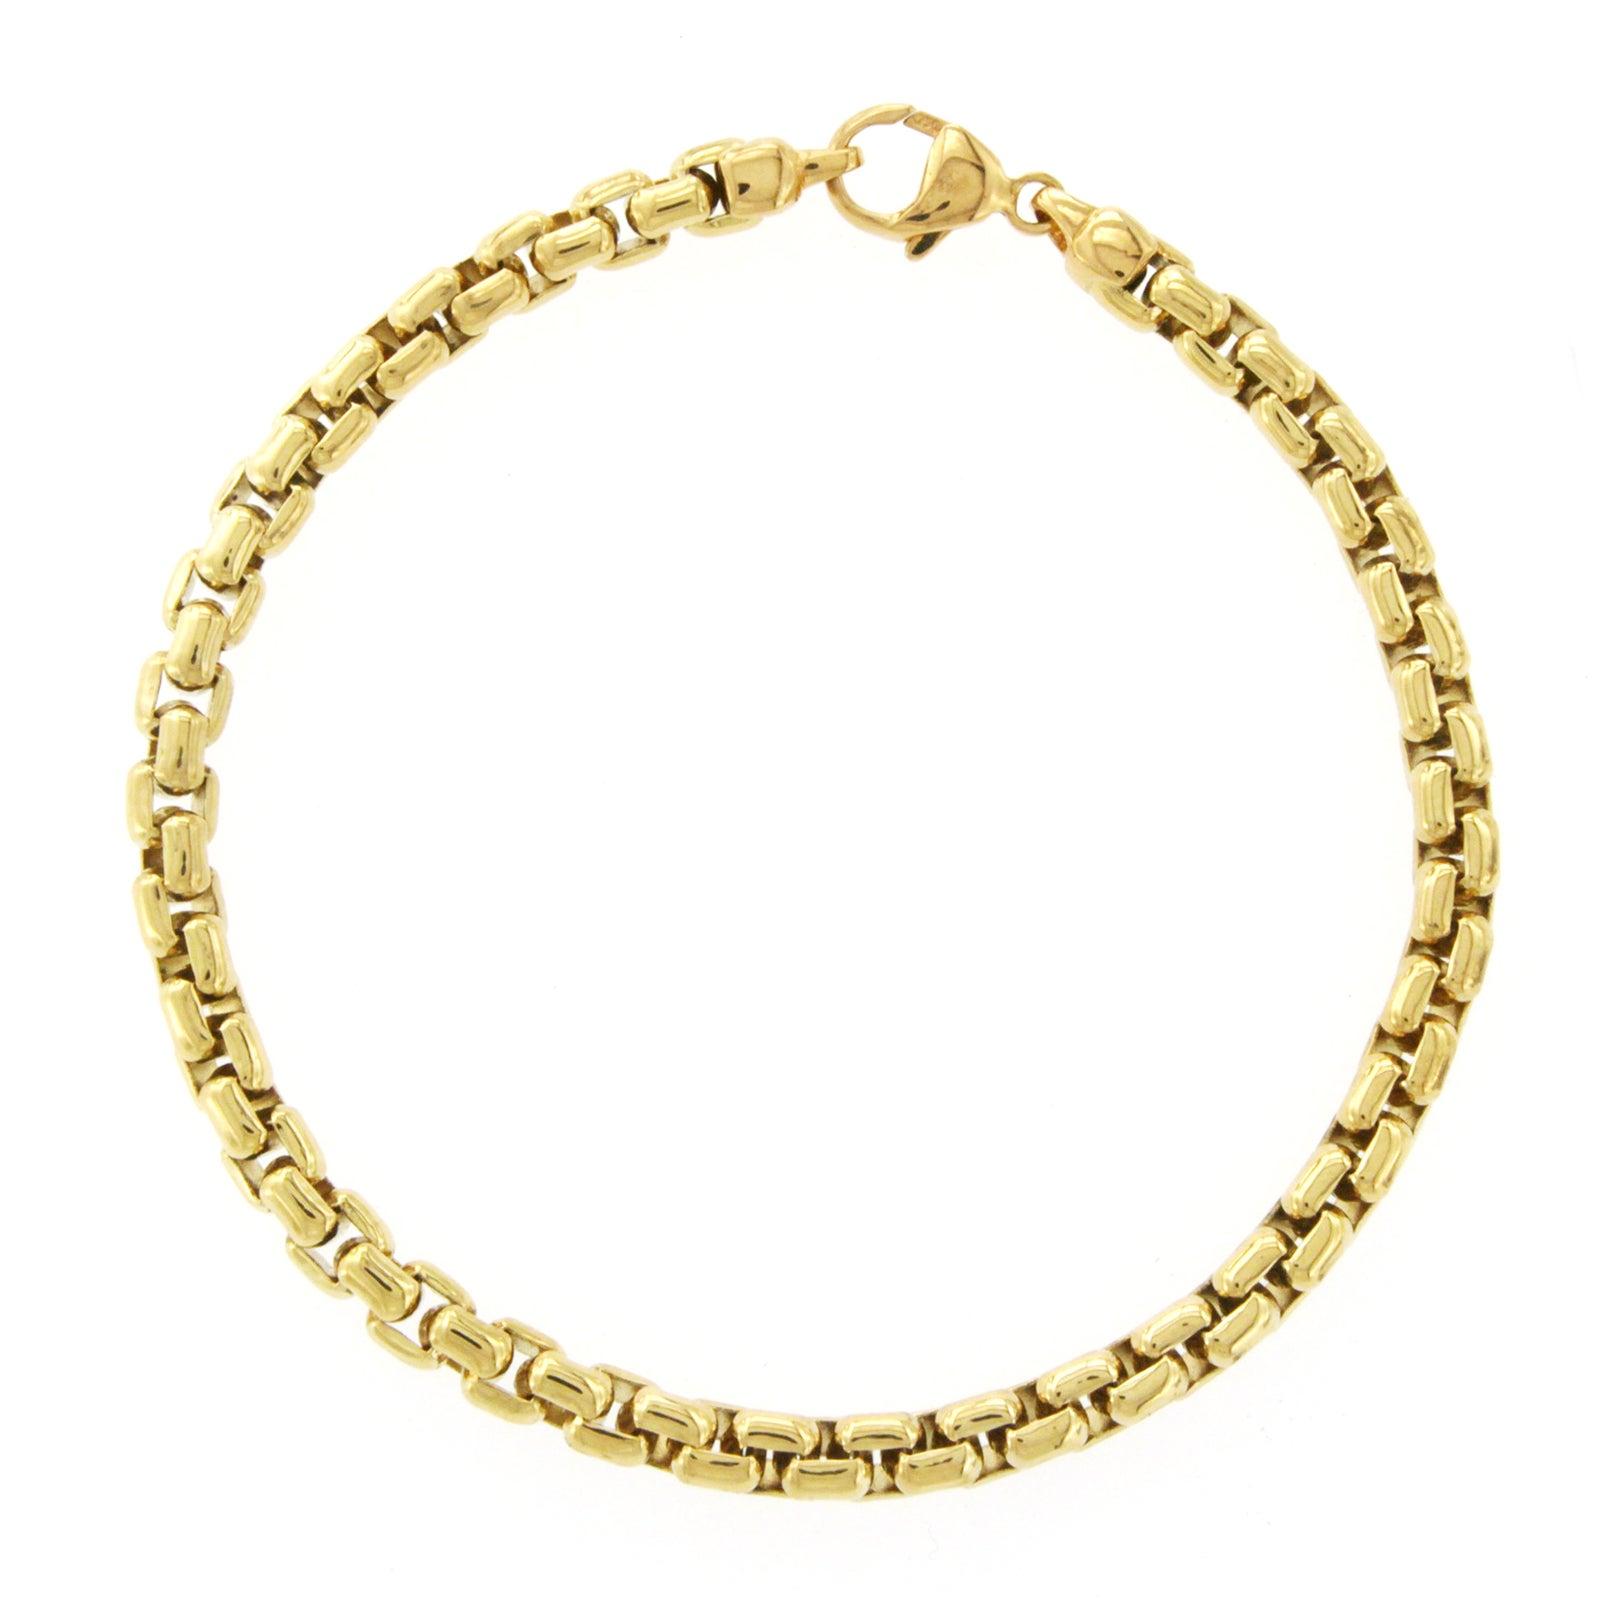 Tiffany & Co. 18 Karat Yellow Gold Box Link Bracelet